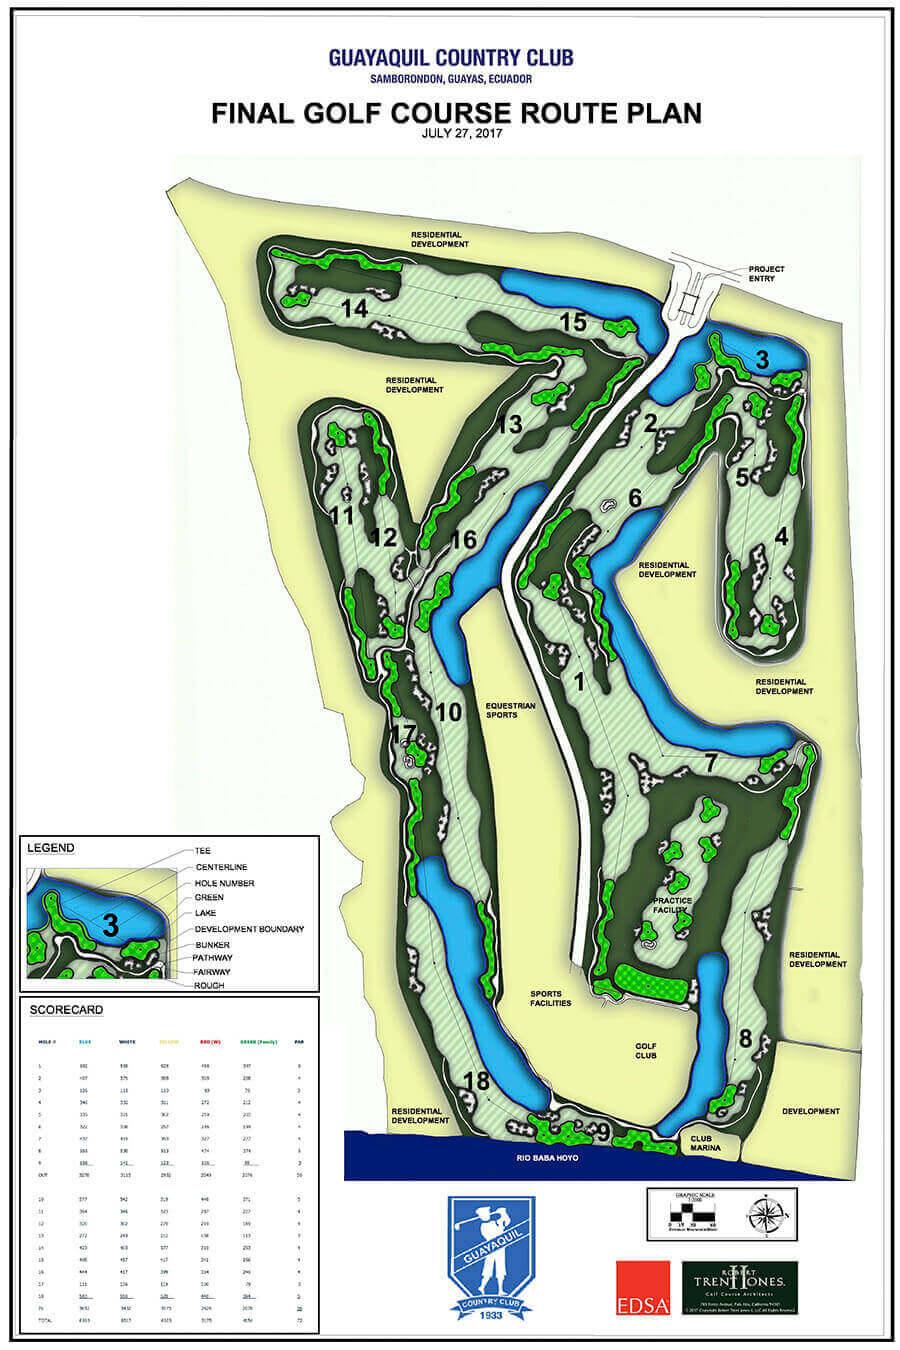 Final Golf Course Plan Guayaquil Country Club Samborondon Ecuador